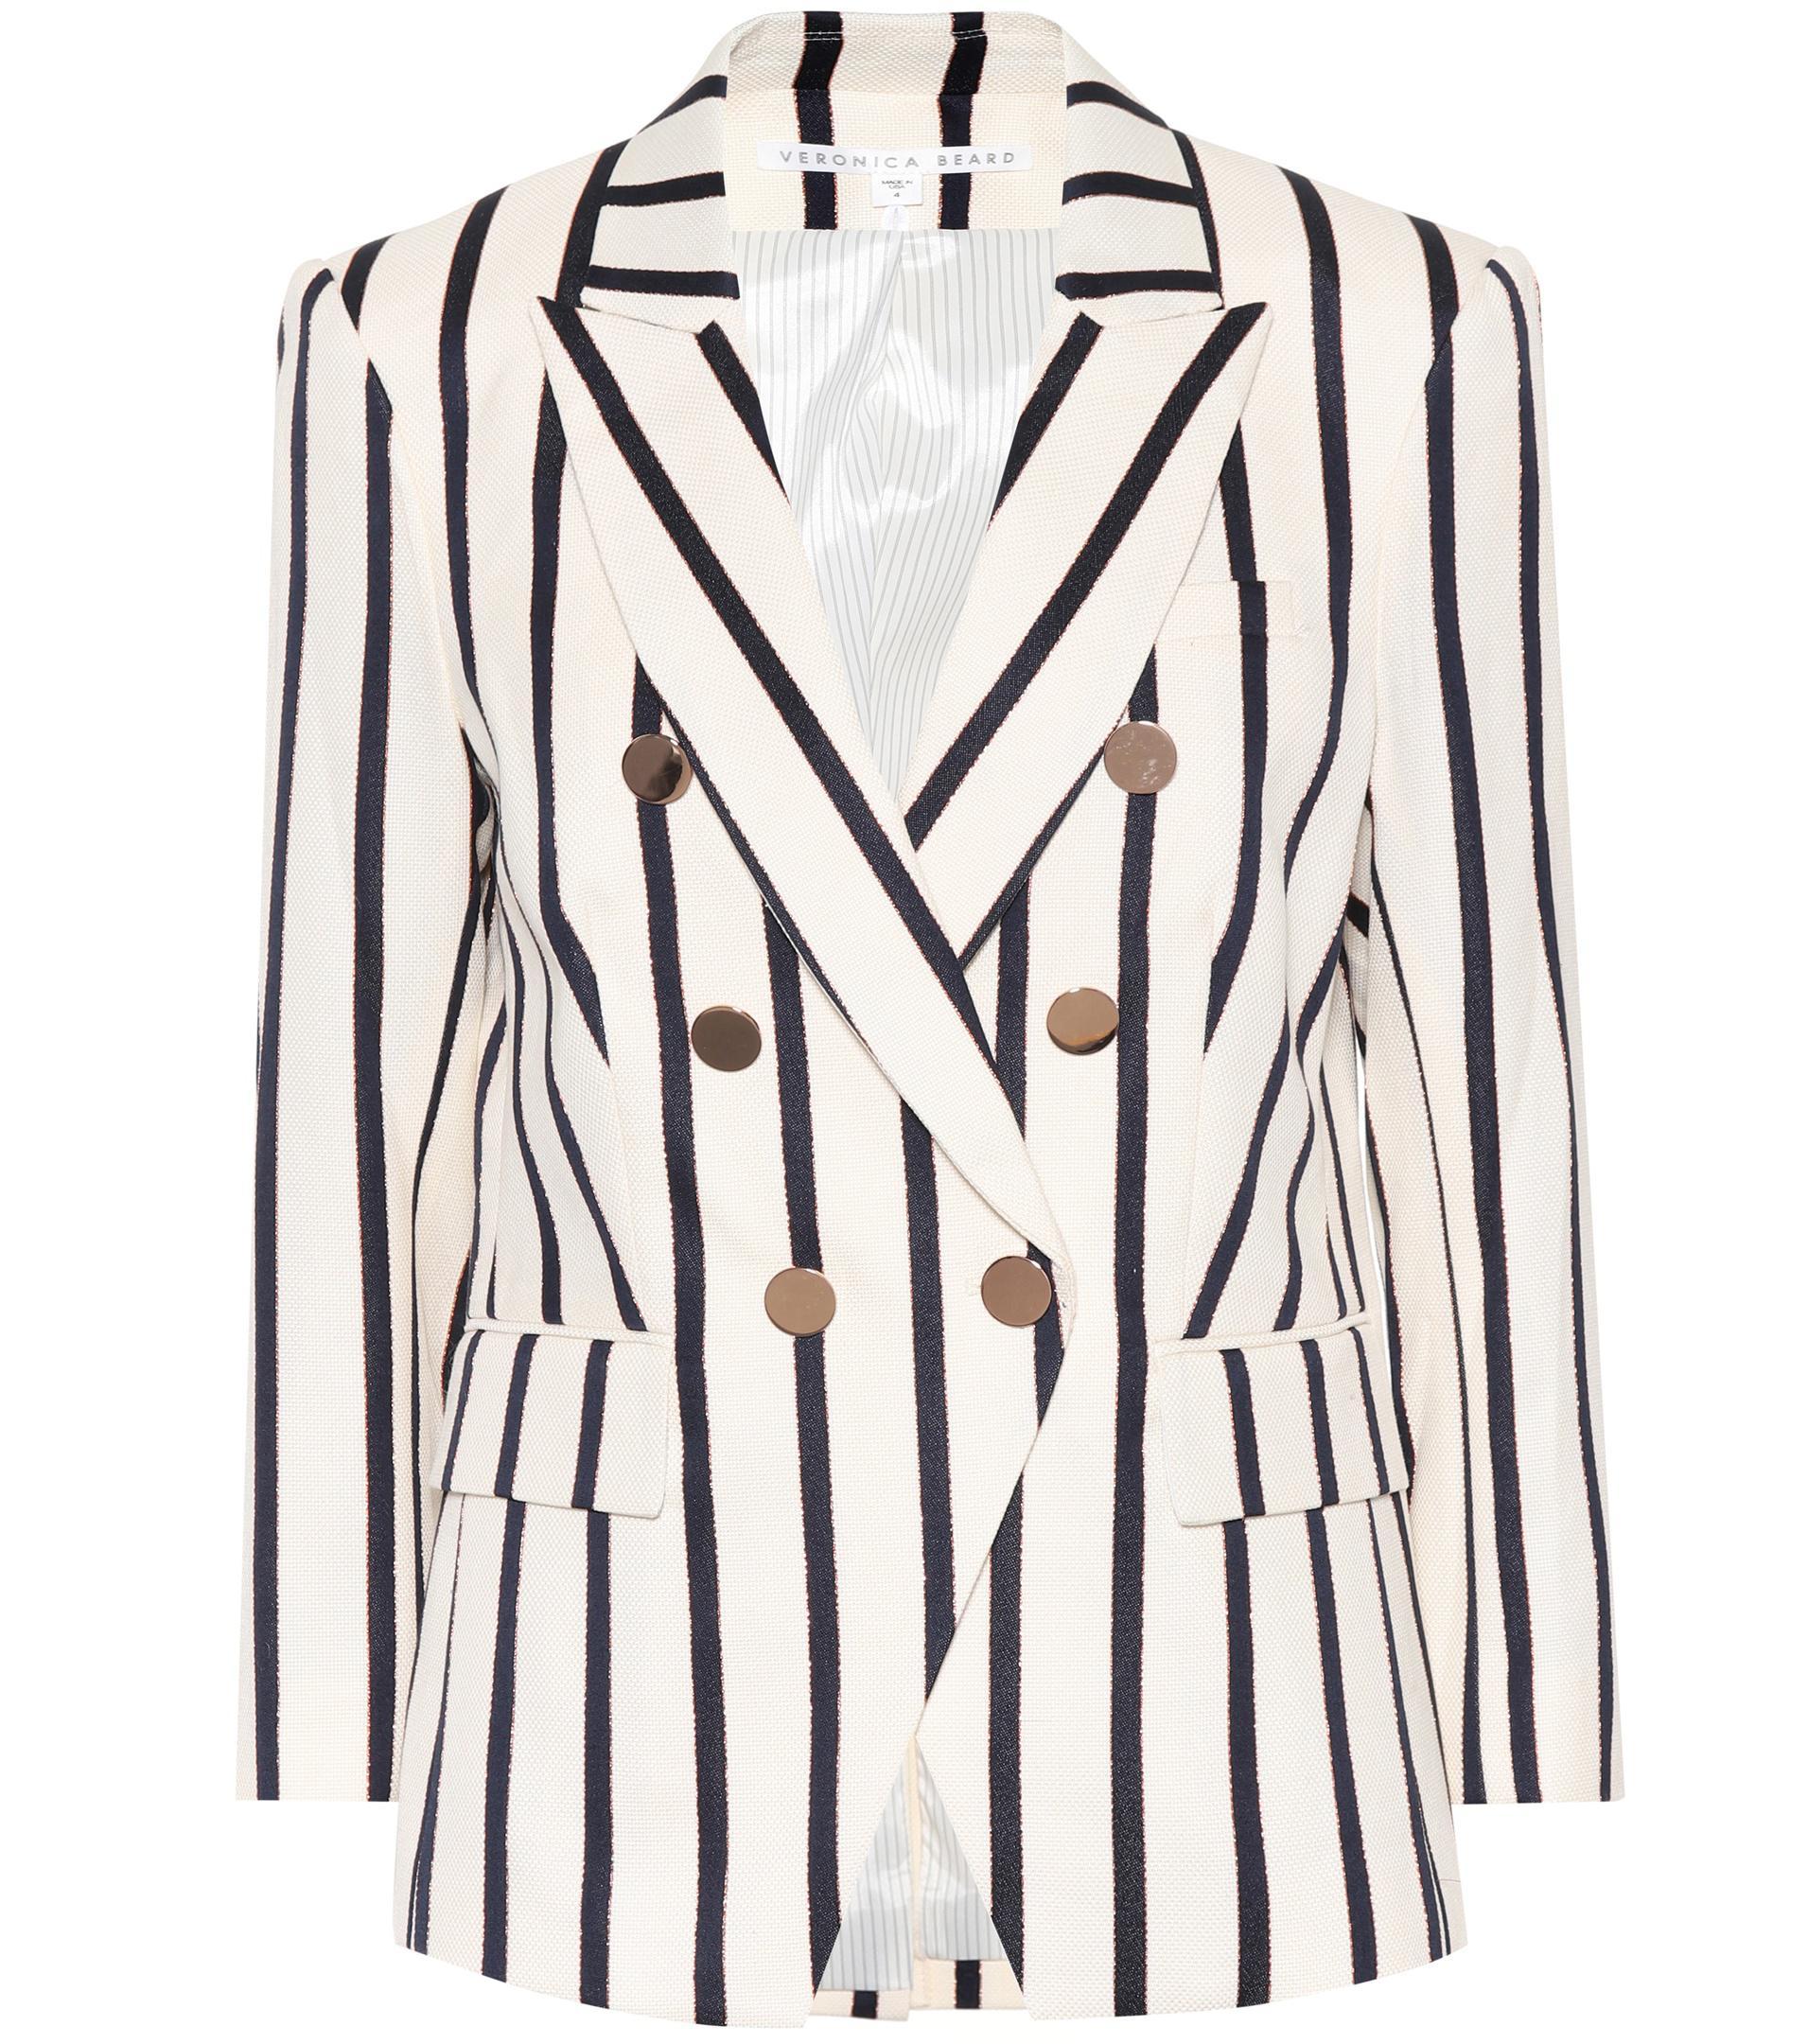 6bf81df90e3a Veronica Beard Empire Striped Dickey Blazer in White - Lyst